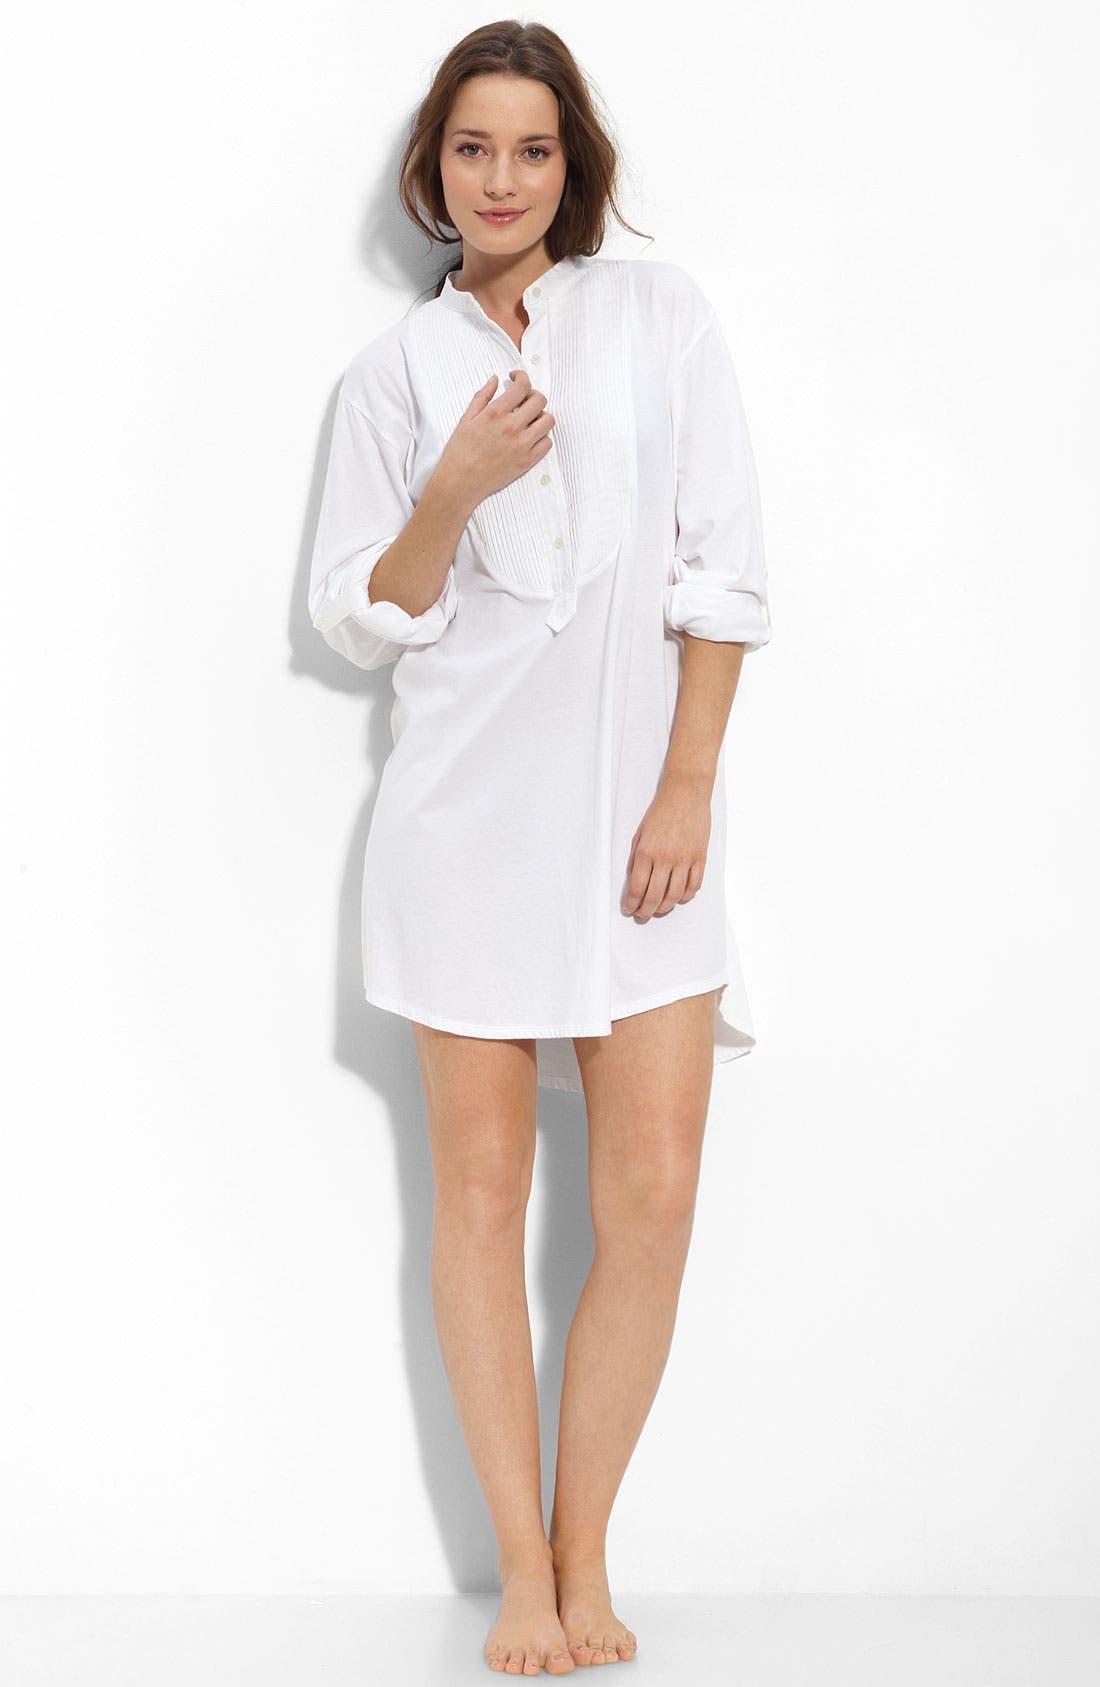 Alternate Image 1 Selected - Lauren Intimates 'Grandfather' Tuxedo Bib Sleep Shirt